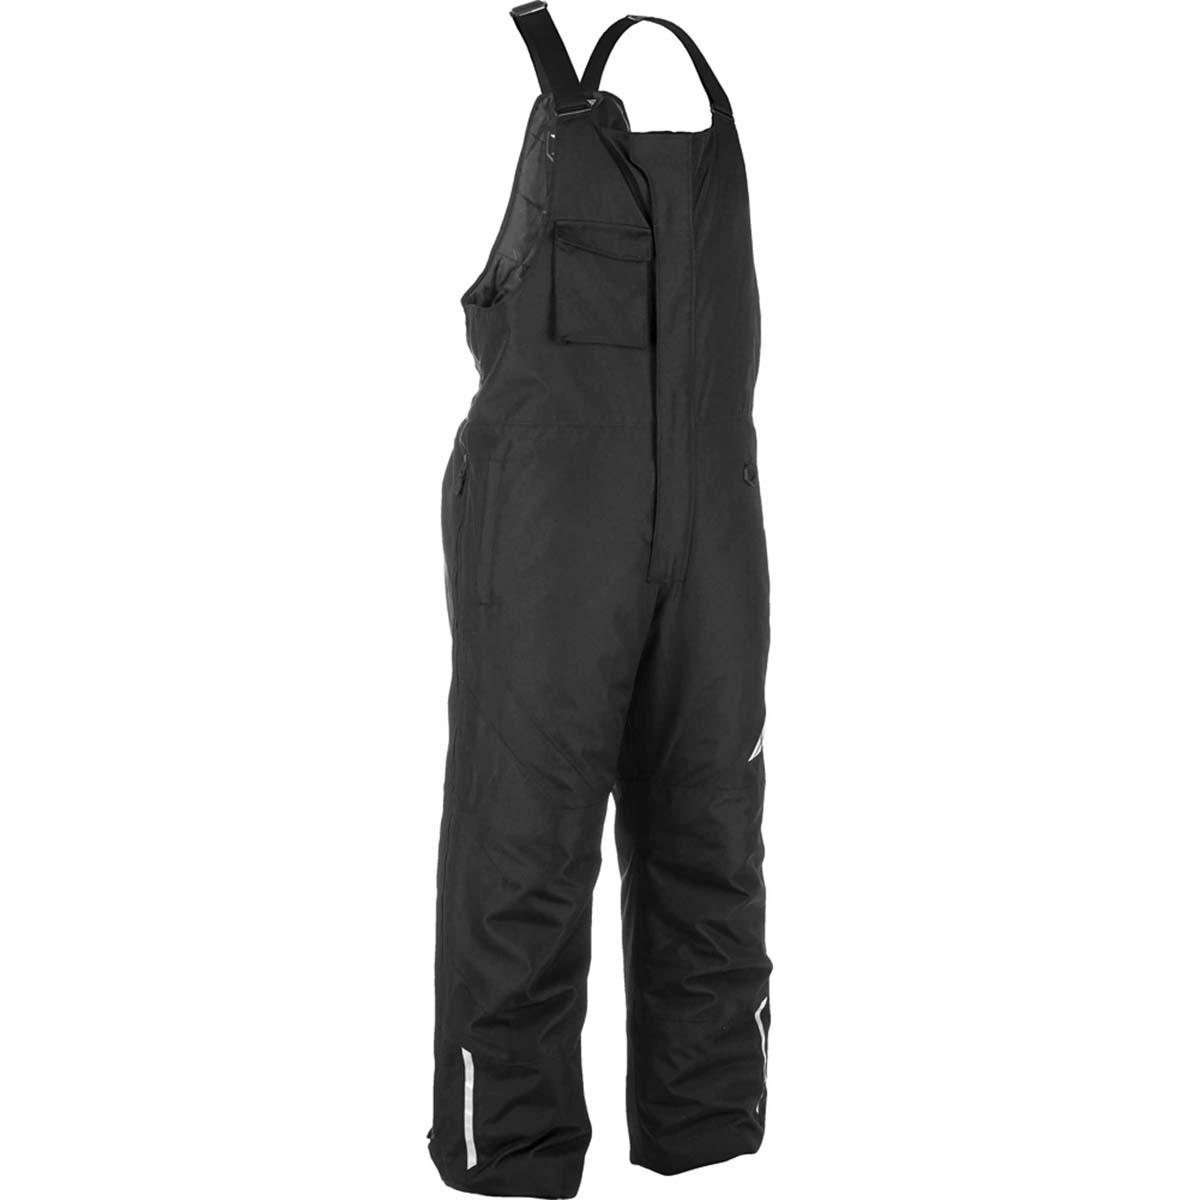 Fly Racing Aurora Bib//Pants Black Weatherproof Waterproof Windproof Youth XS-4XL